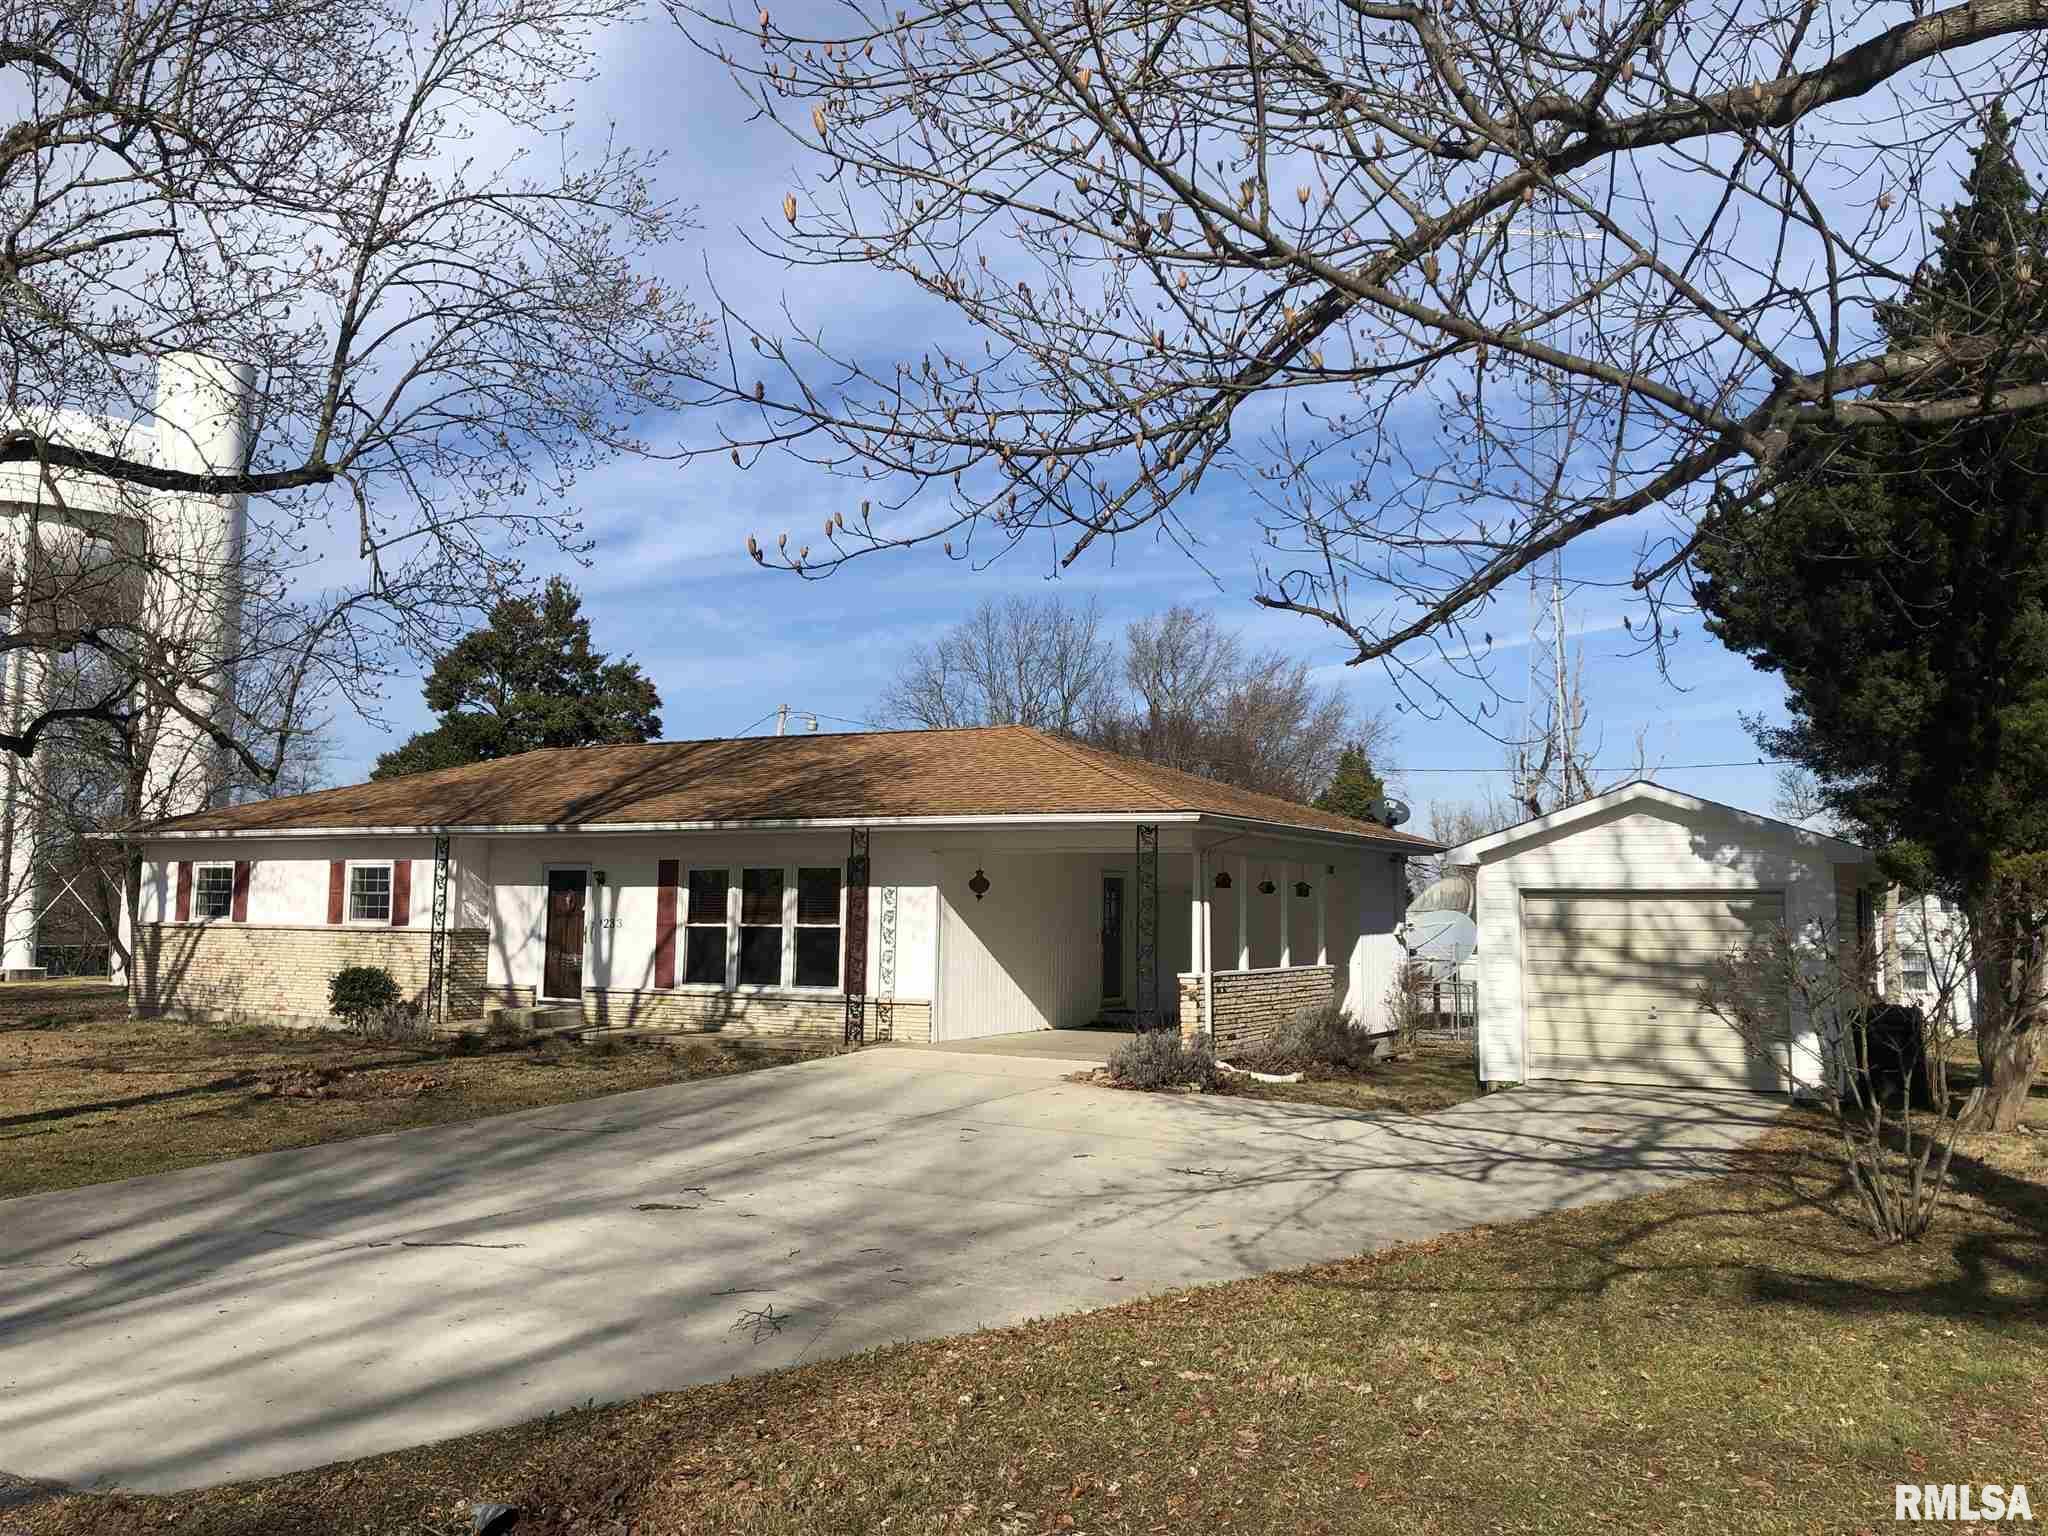 233 E ROSALIE Property Photo - Golconda, IL real estate listing